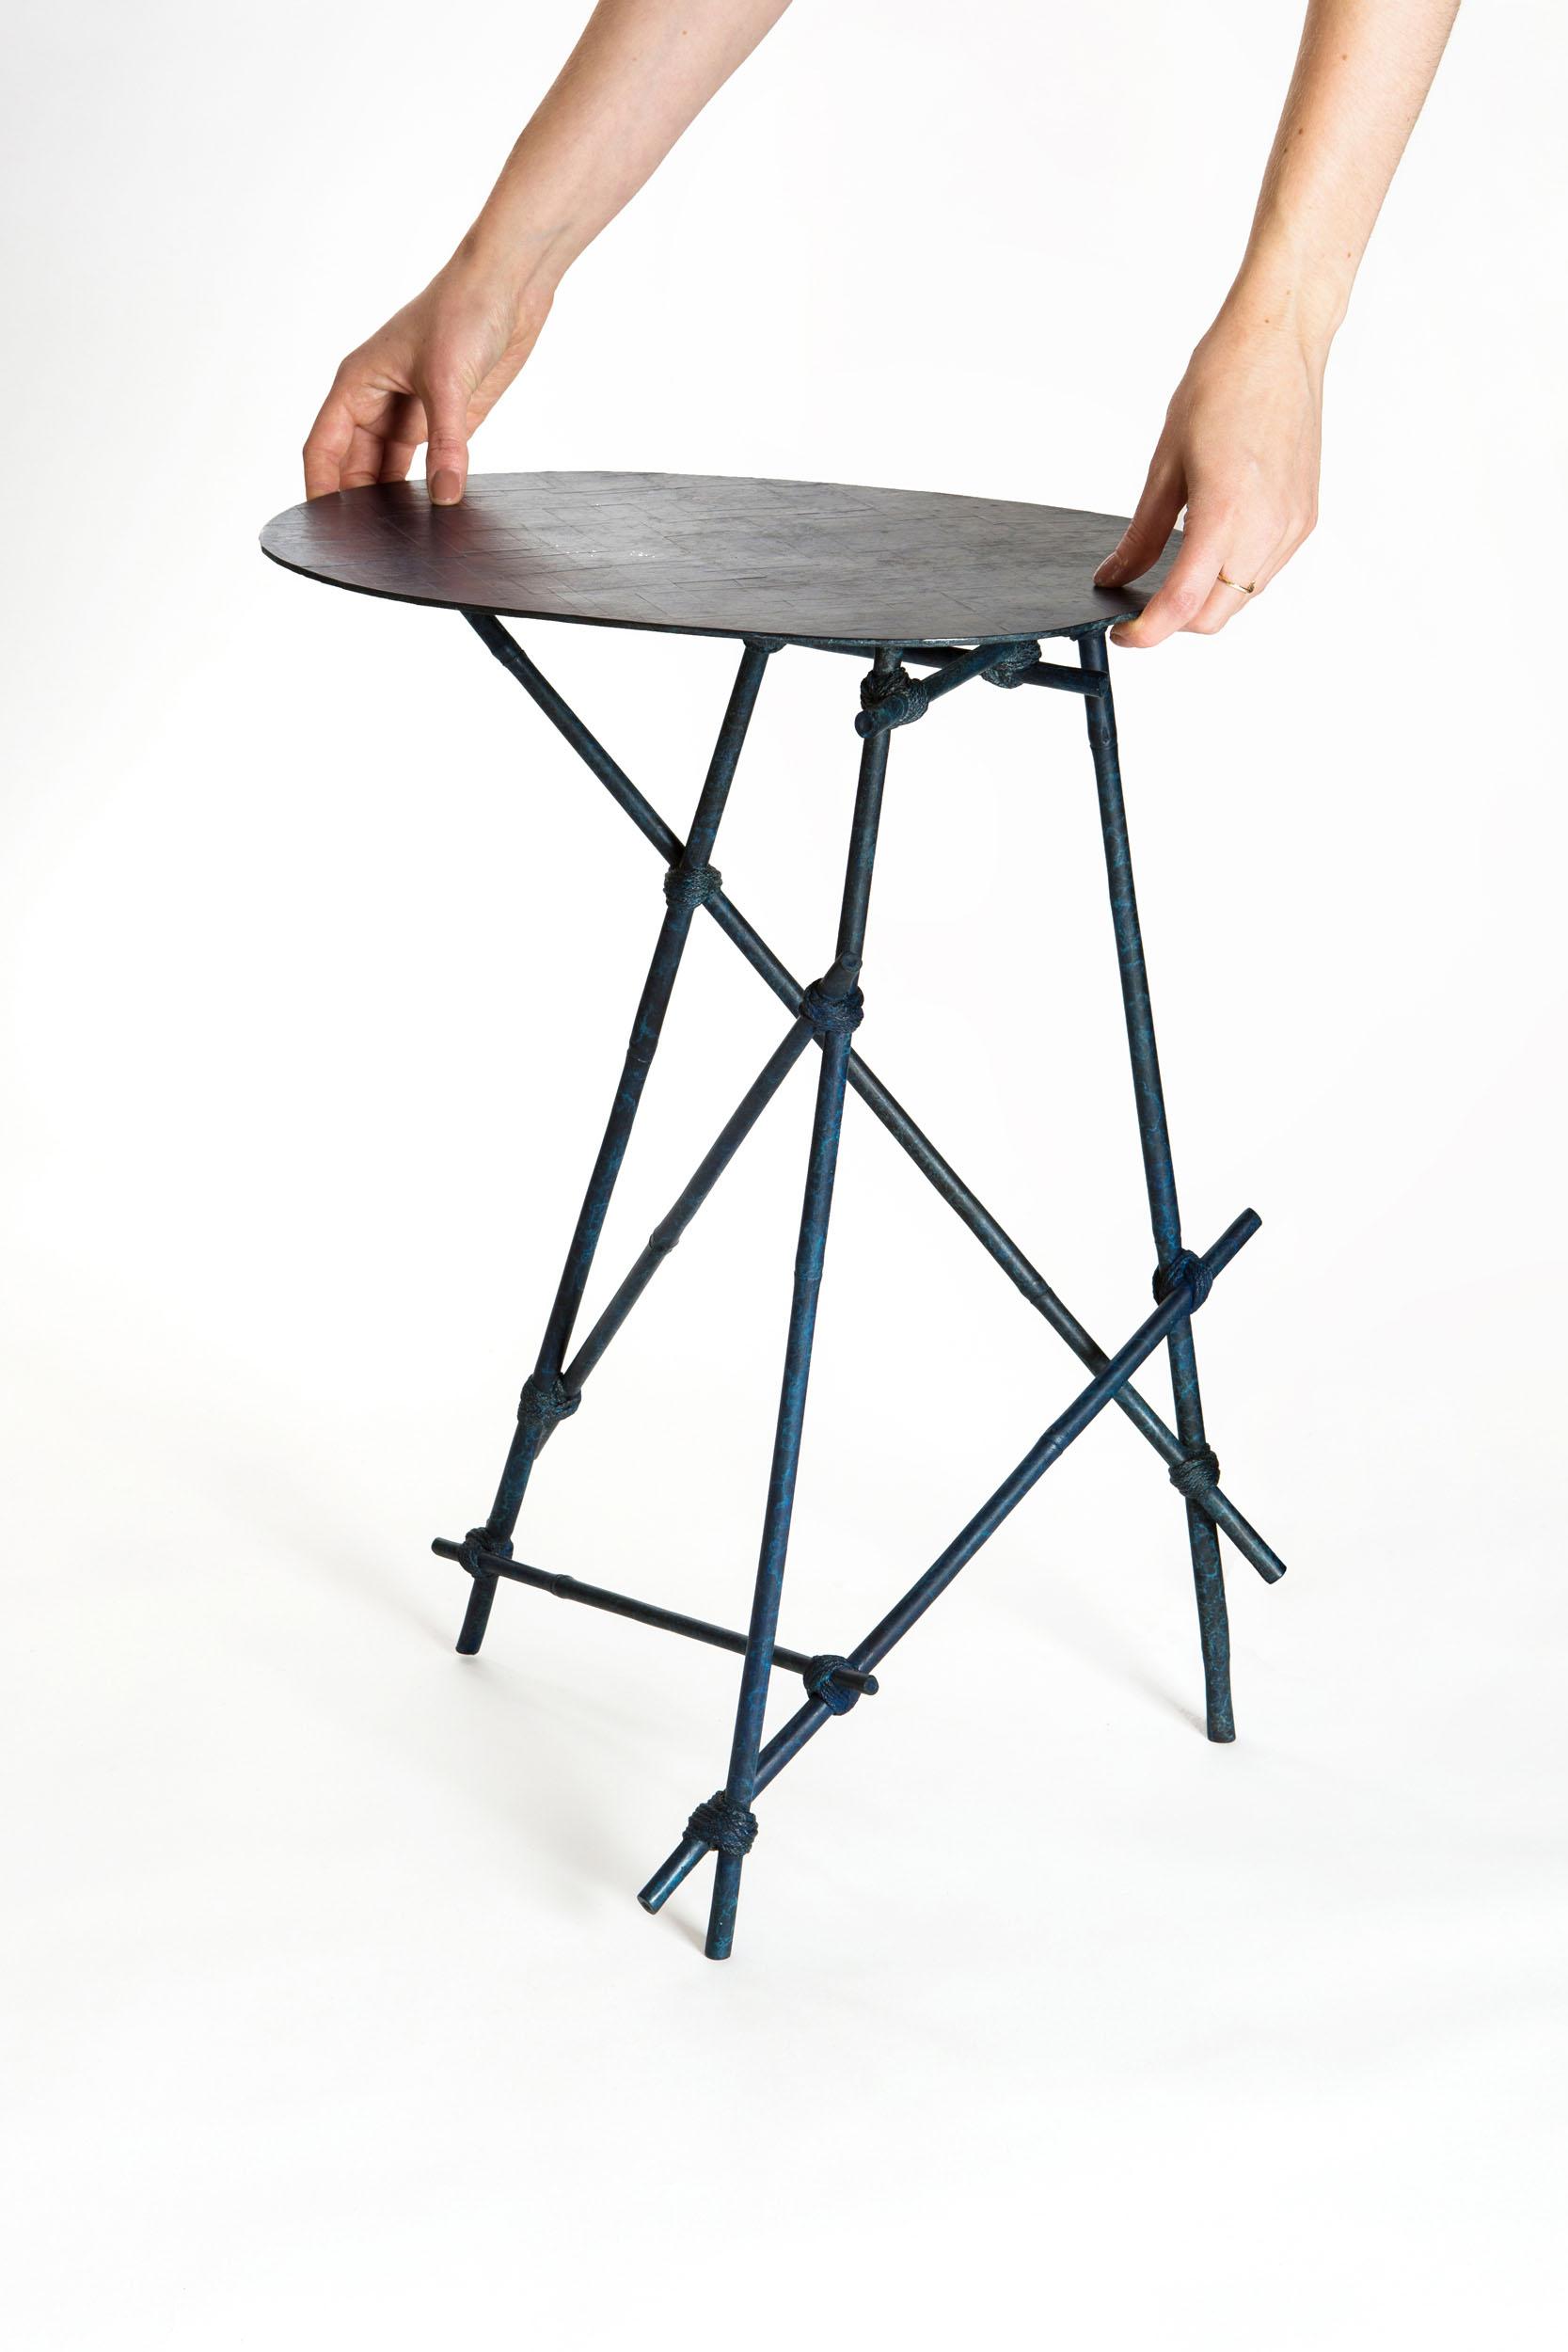 Mise en Place side table in bronze cast frame